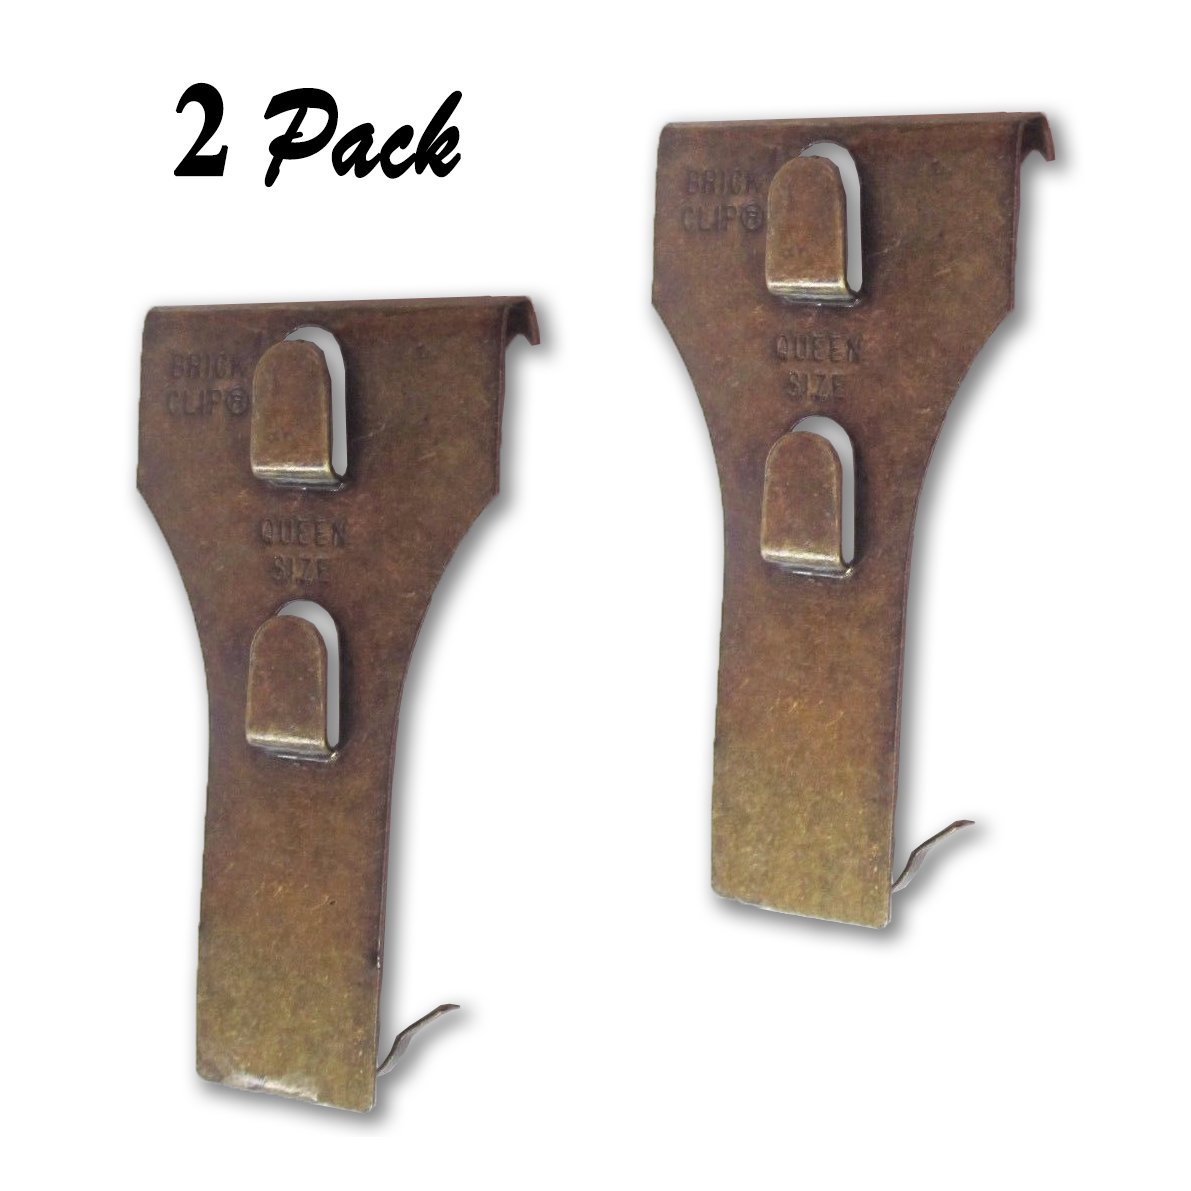 Queen Size Brick Clip Fastener Hanger Supports 25lb Fits 2.5'' -2.75'' (2 Pack) Bricks